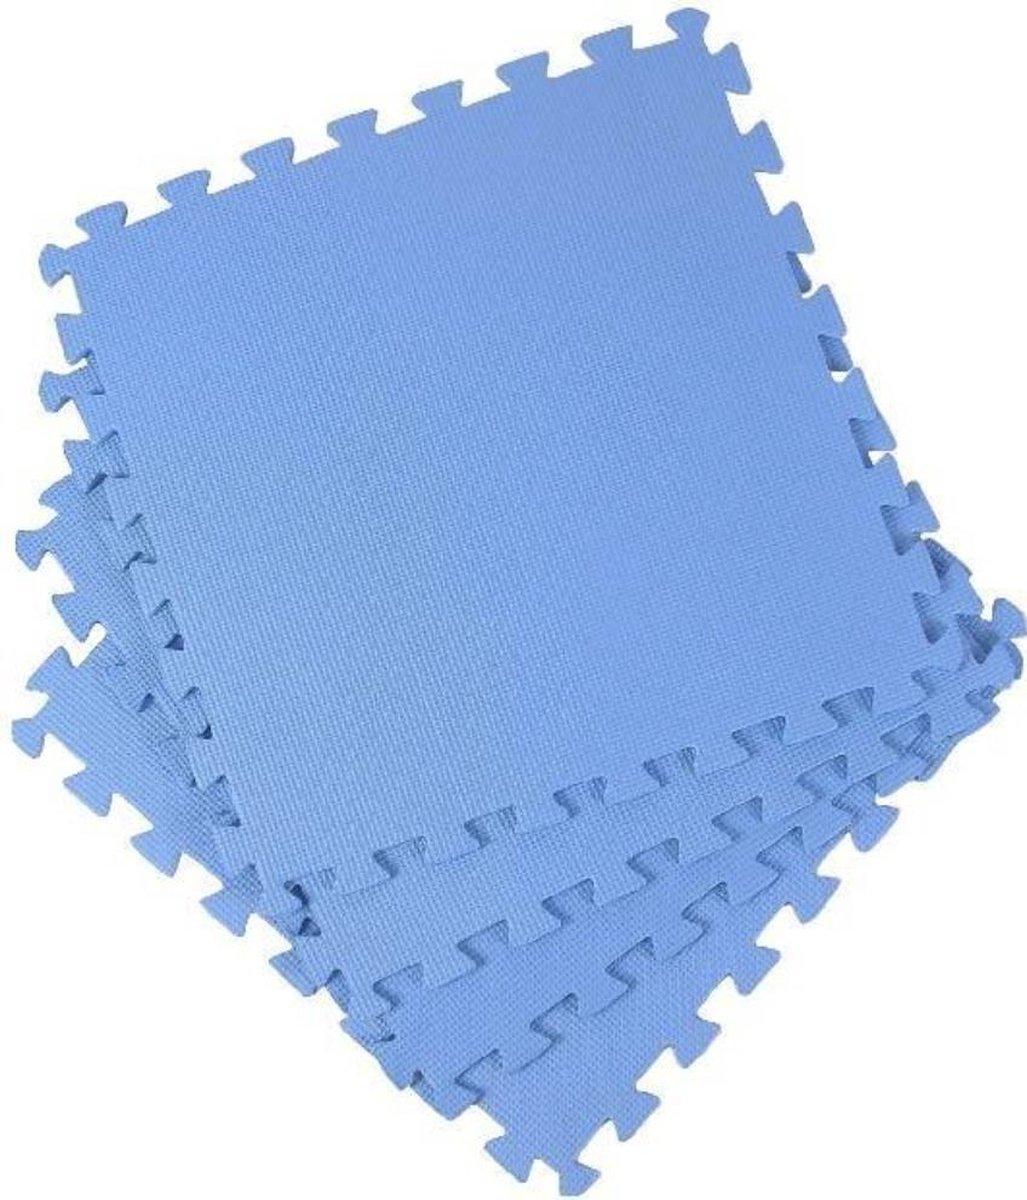 Zwembadtegels | 50x50x0,4| Ondervloer | Dunne Ondertegels | Anti Slip| Blauw